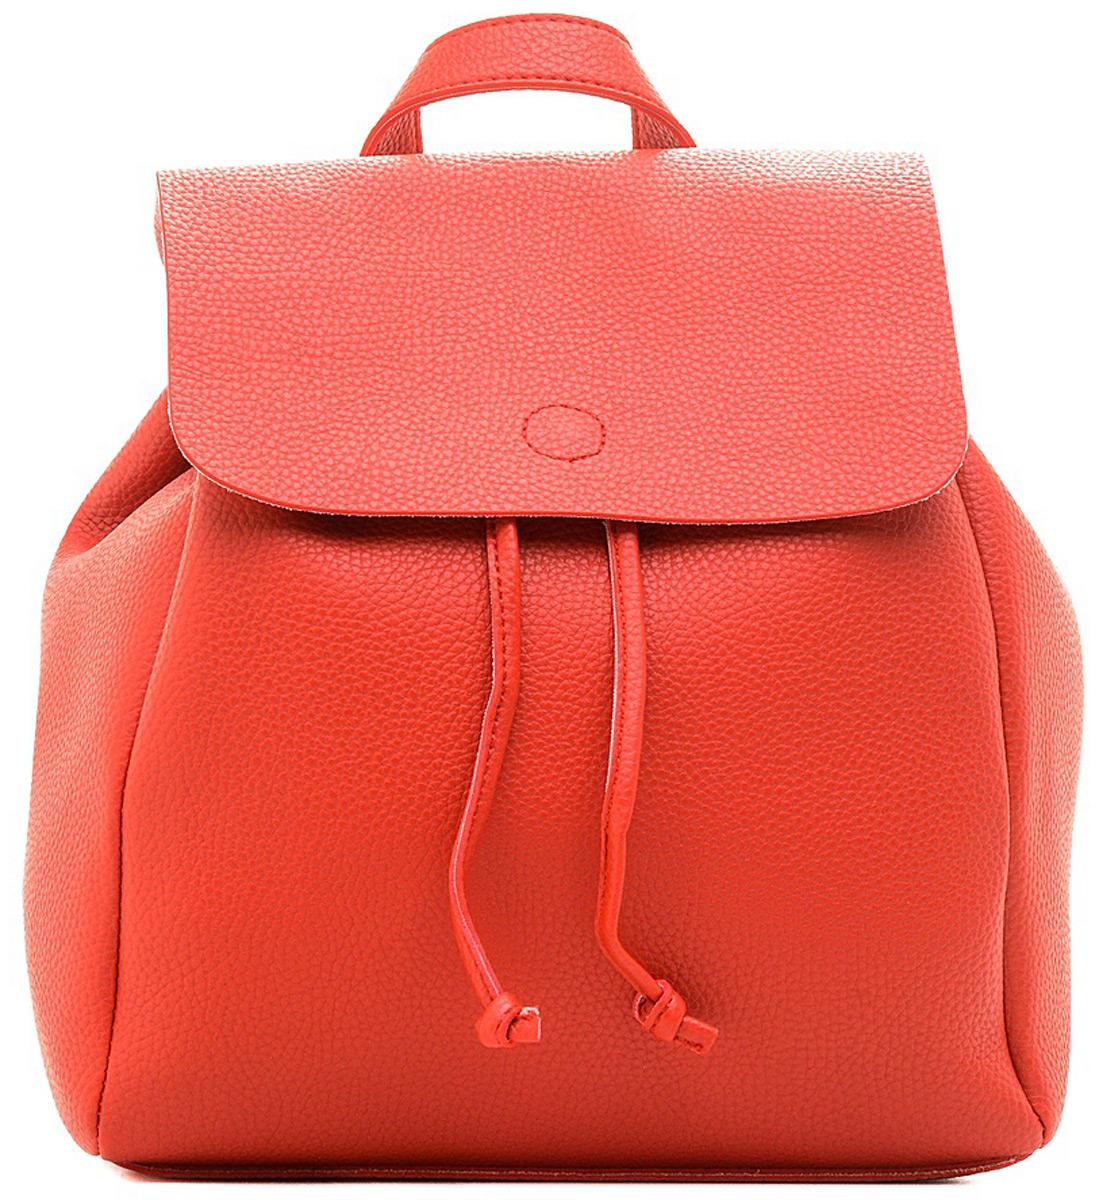 Рюкзак женский United Colors of Benetton, цвет: красный. 6HKVD139S_819 пике женский ml2570 02 красный